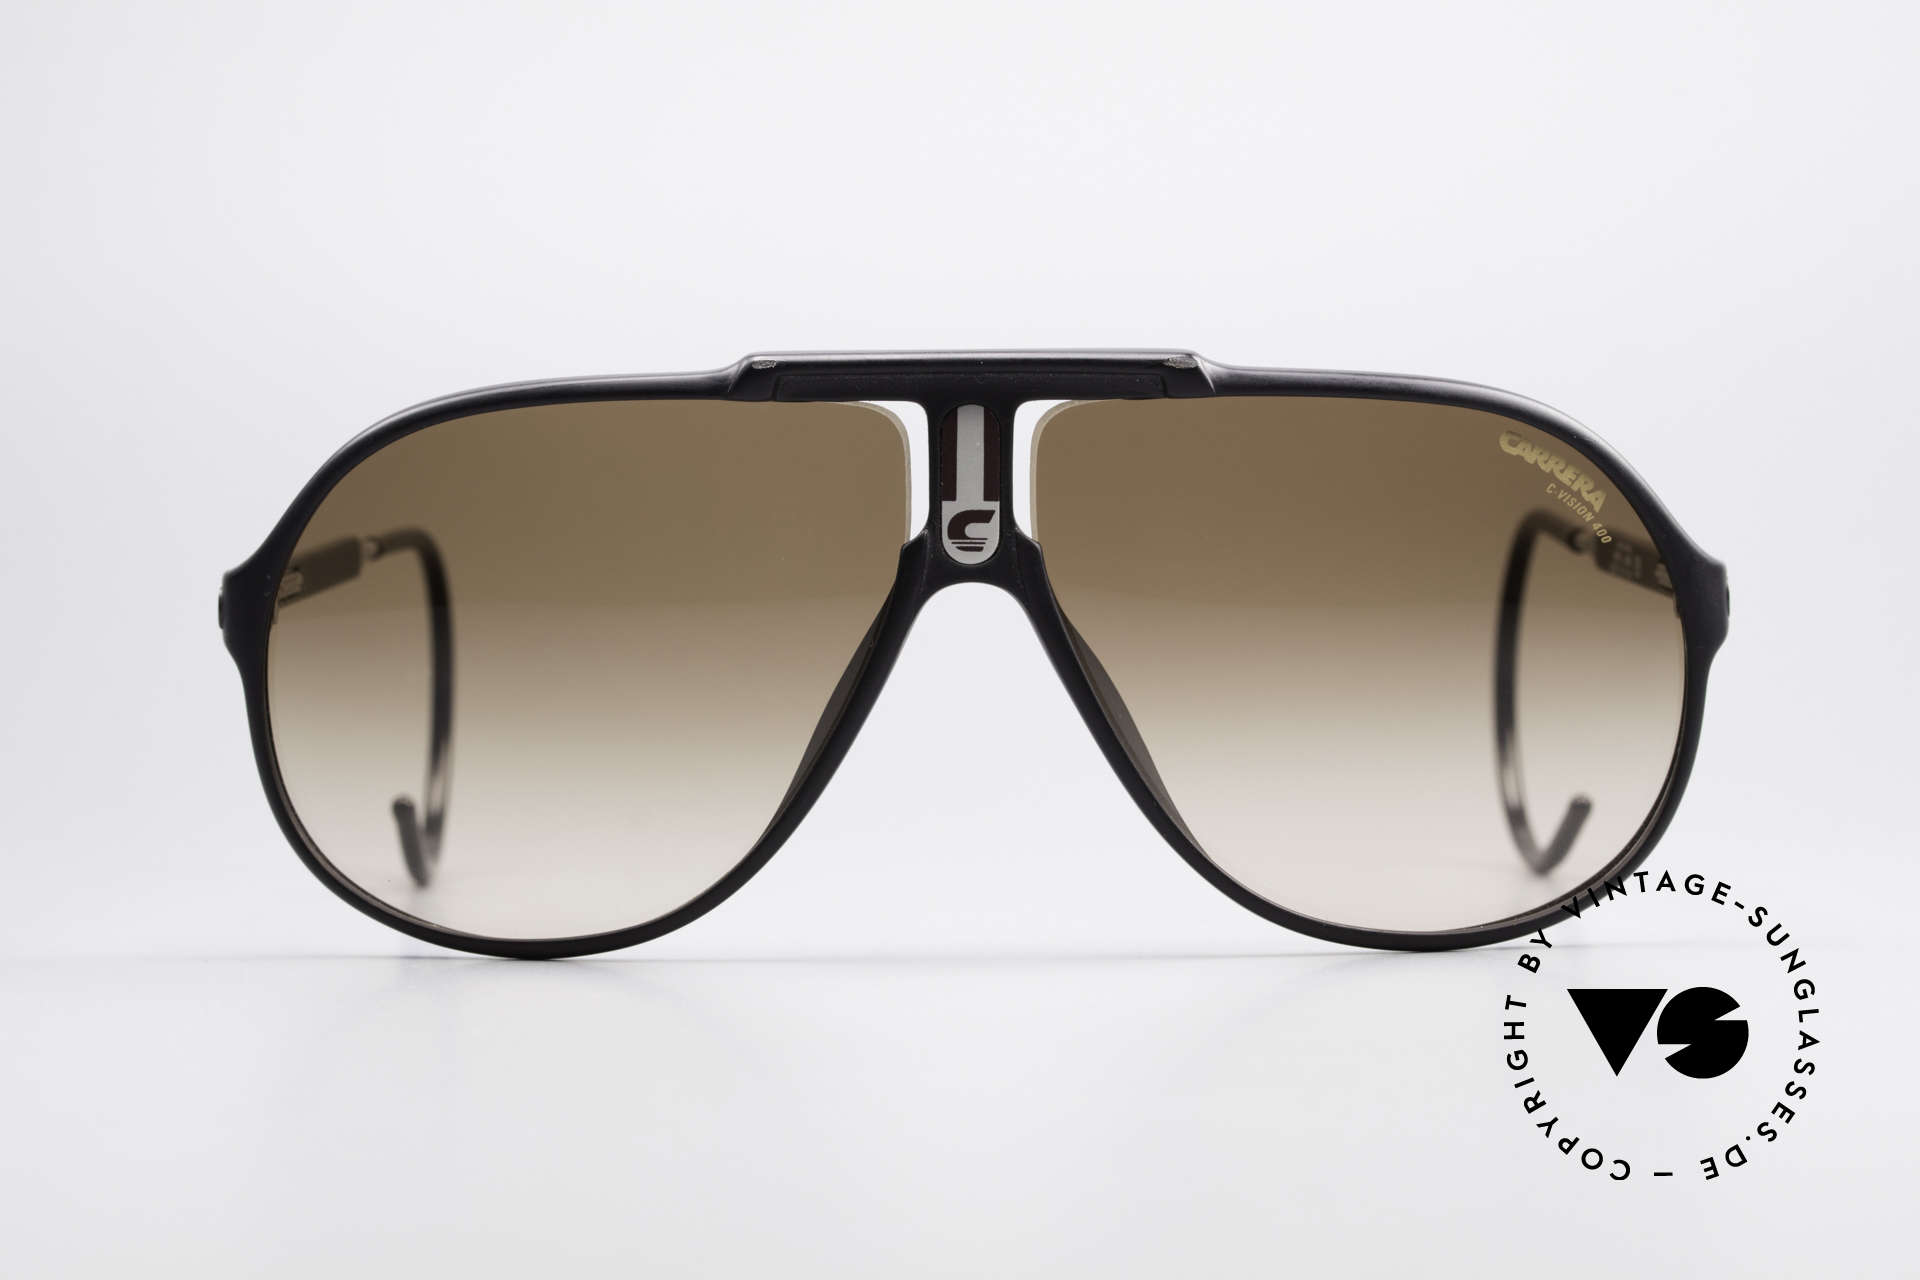 6c3c72d57b46 Sunglasses Carrera 5590 Vario Sports Sunglasses 80's   Vintage ...